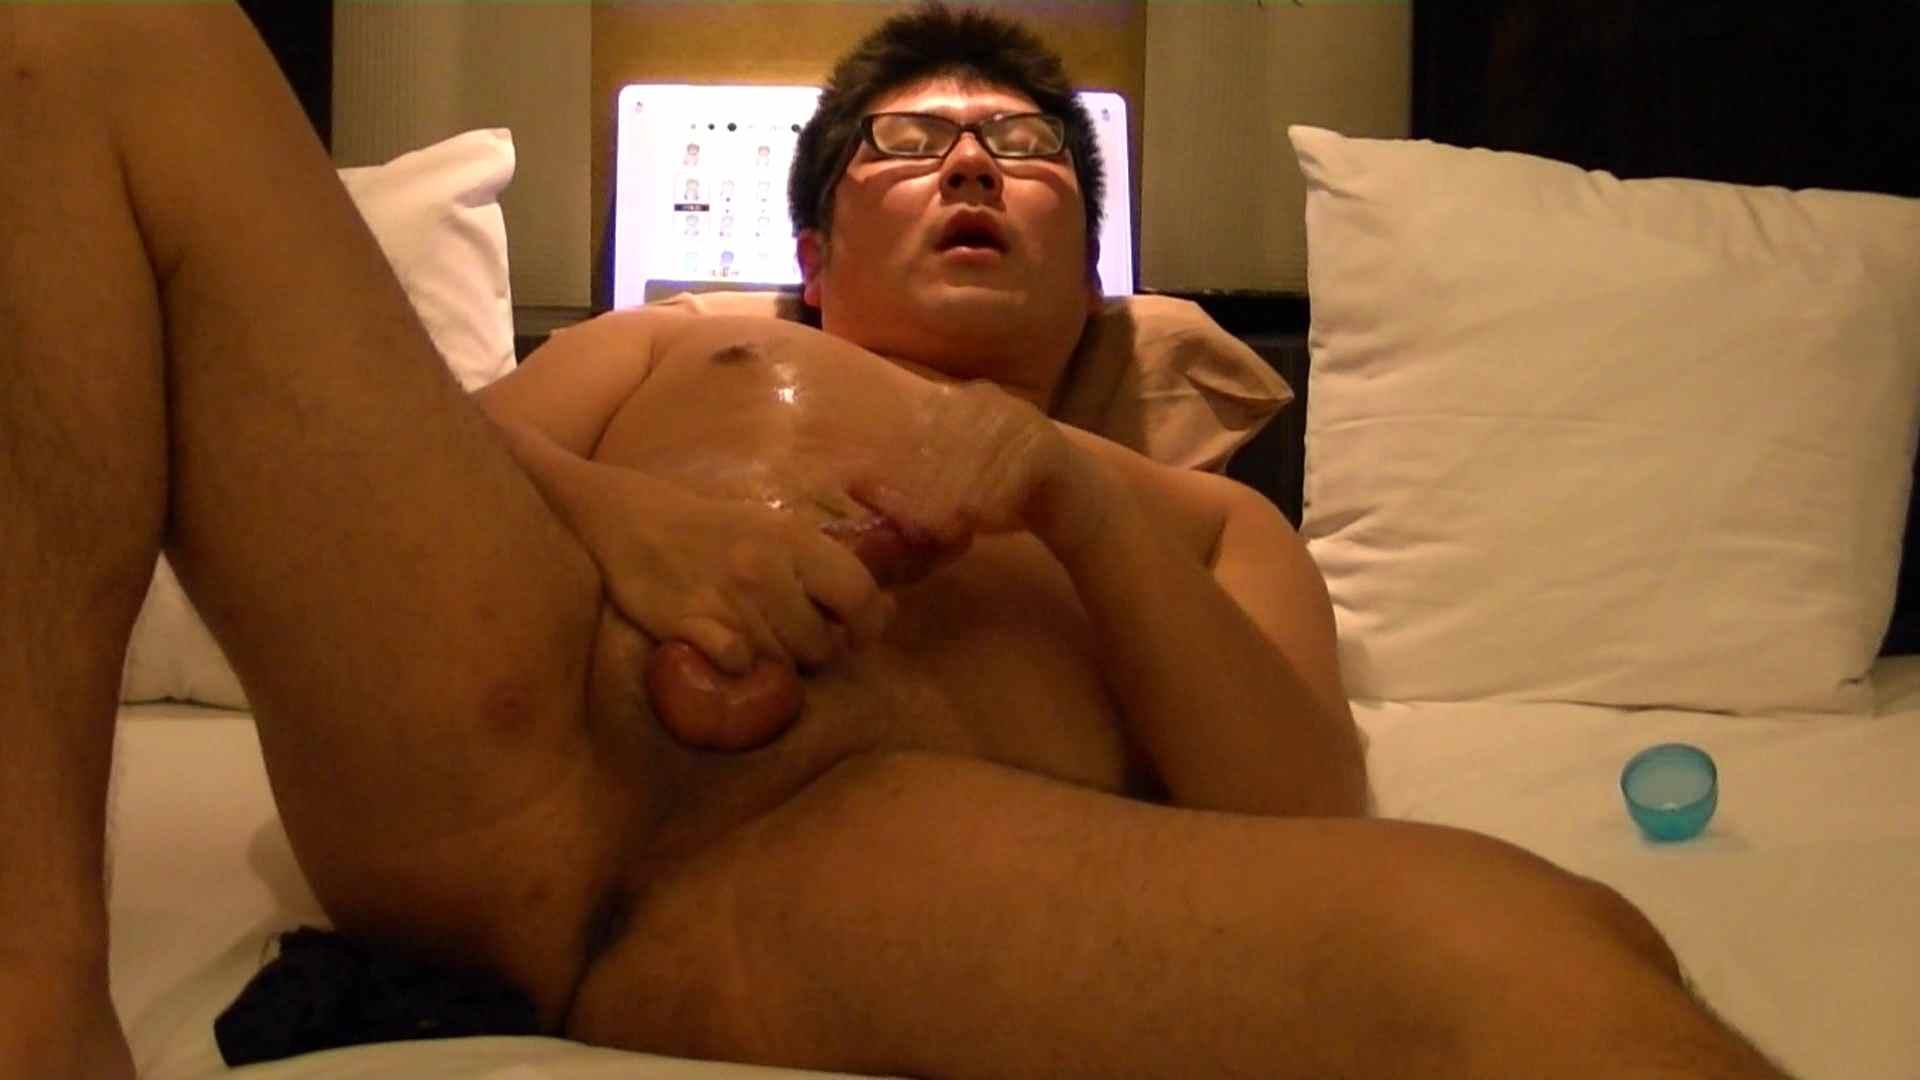 Mr.オナックスさん投稿!HD 貴方のオナニー三万円で撮影させてください。VOL.03 後編 オナニー編 ゲイAV画像 106枚 74